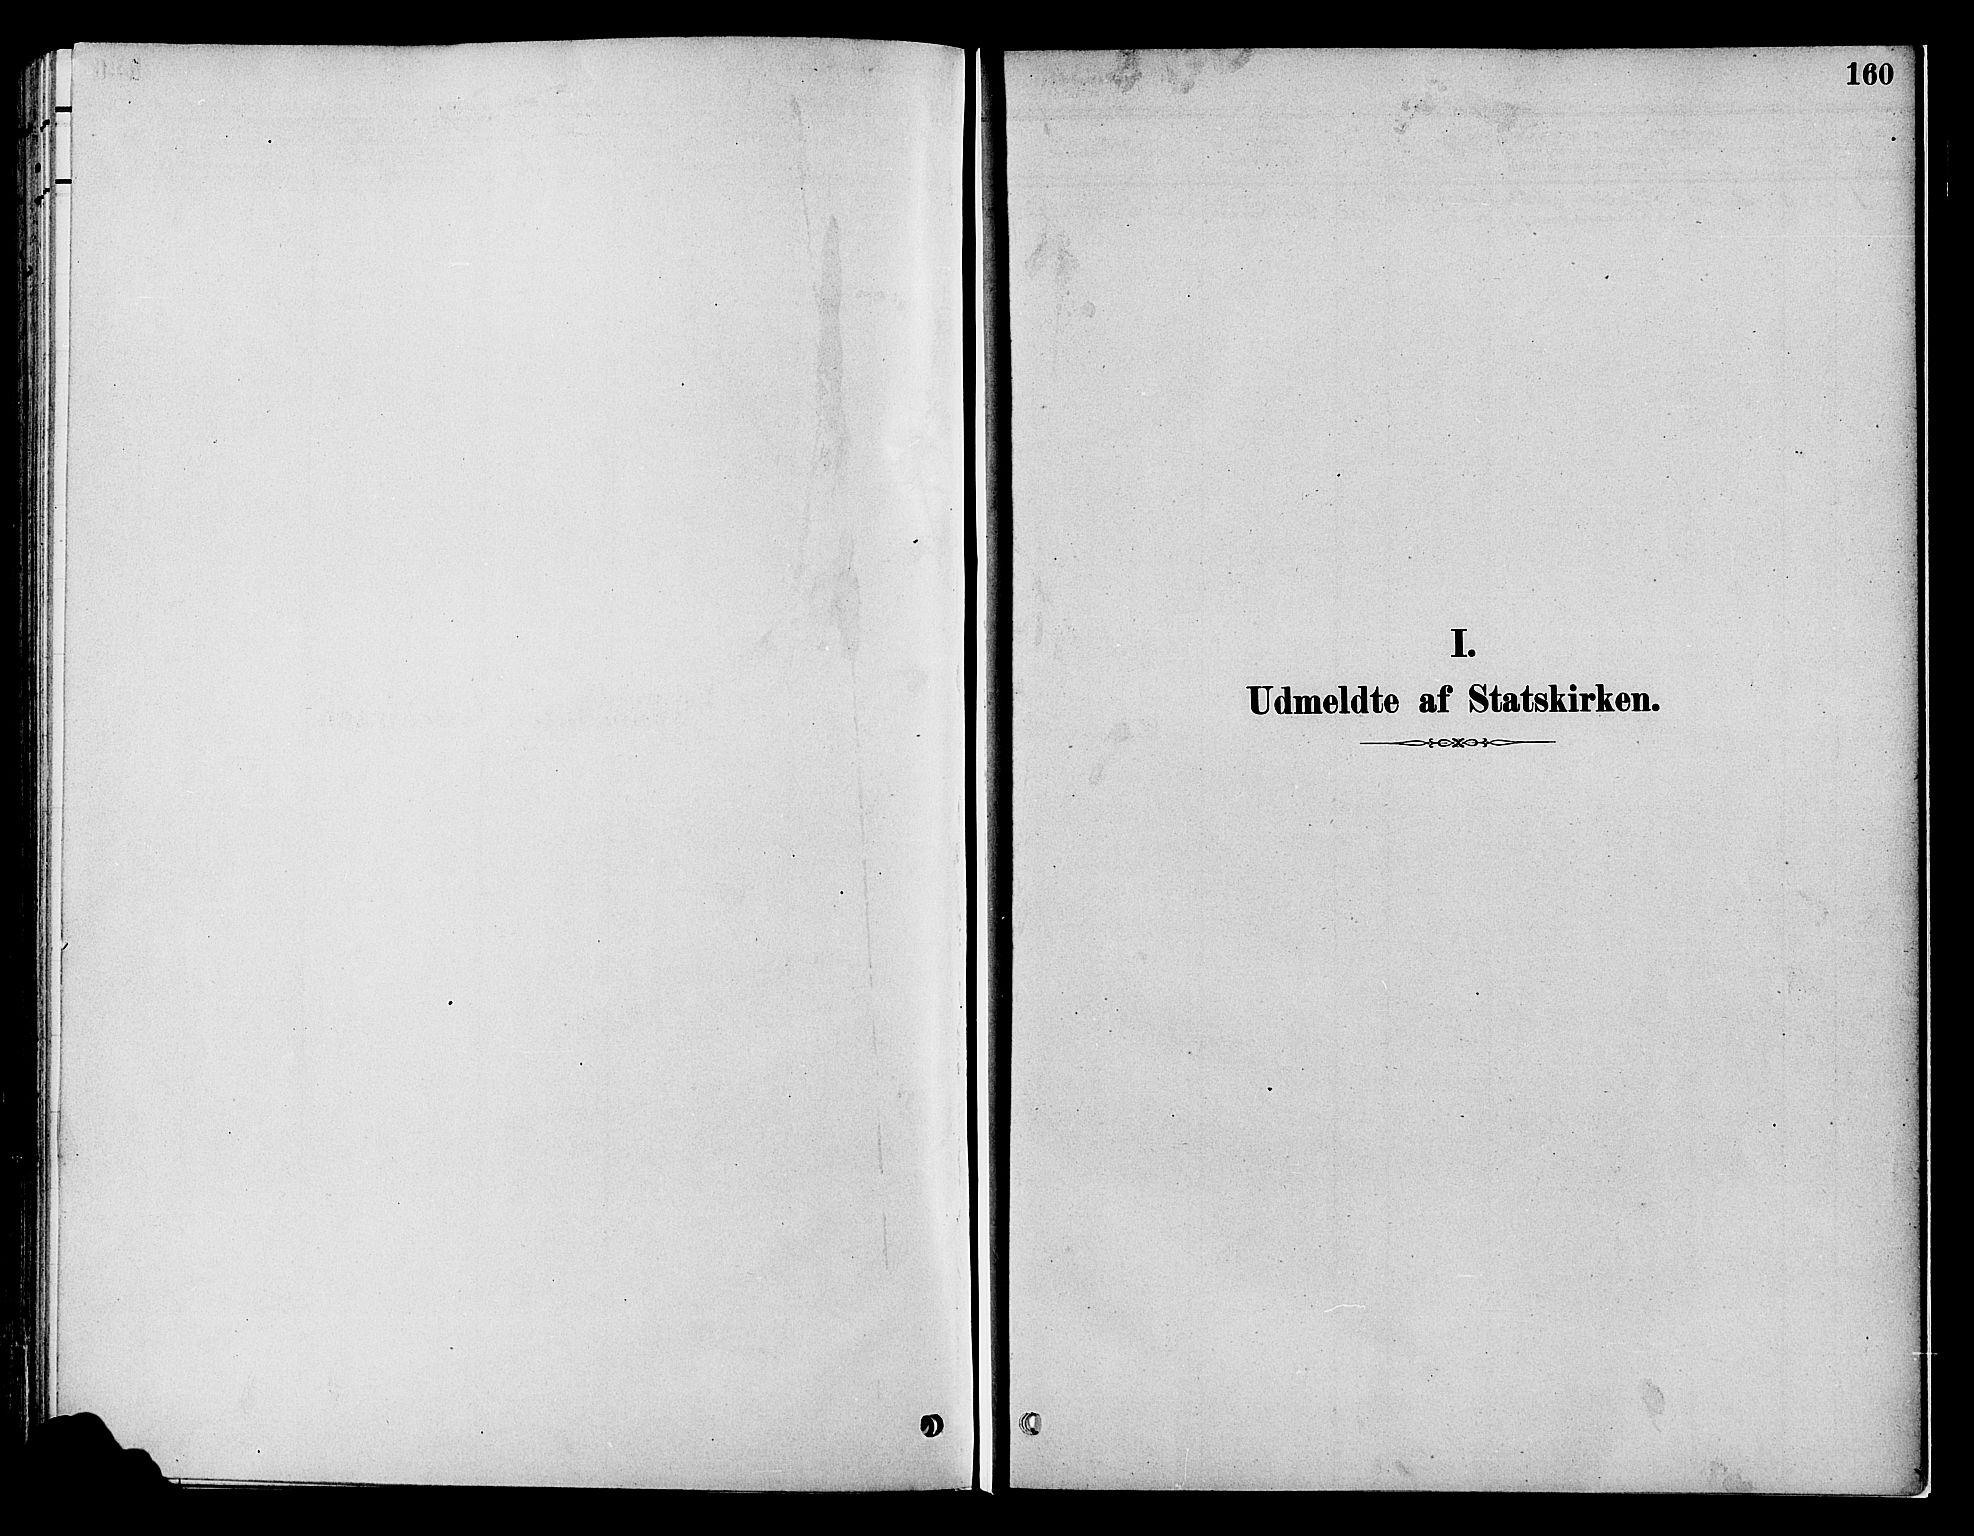 SAH, Gran prestekontor, Ministerialbok nr. 16, 1880-1888, s. 160